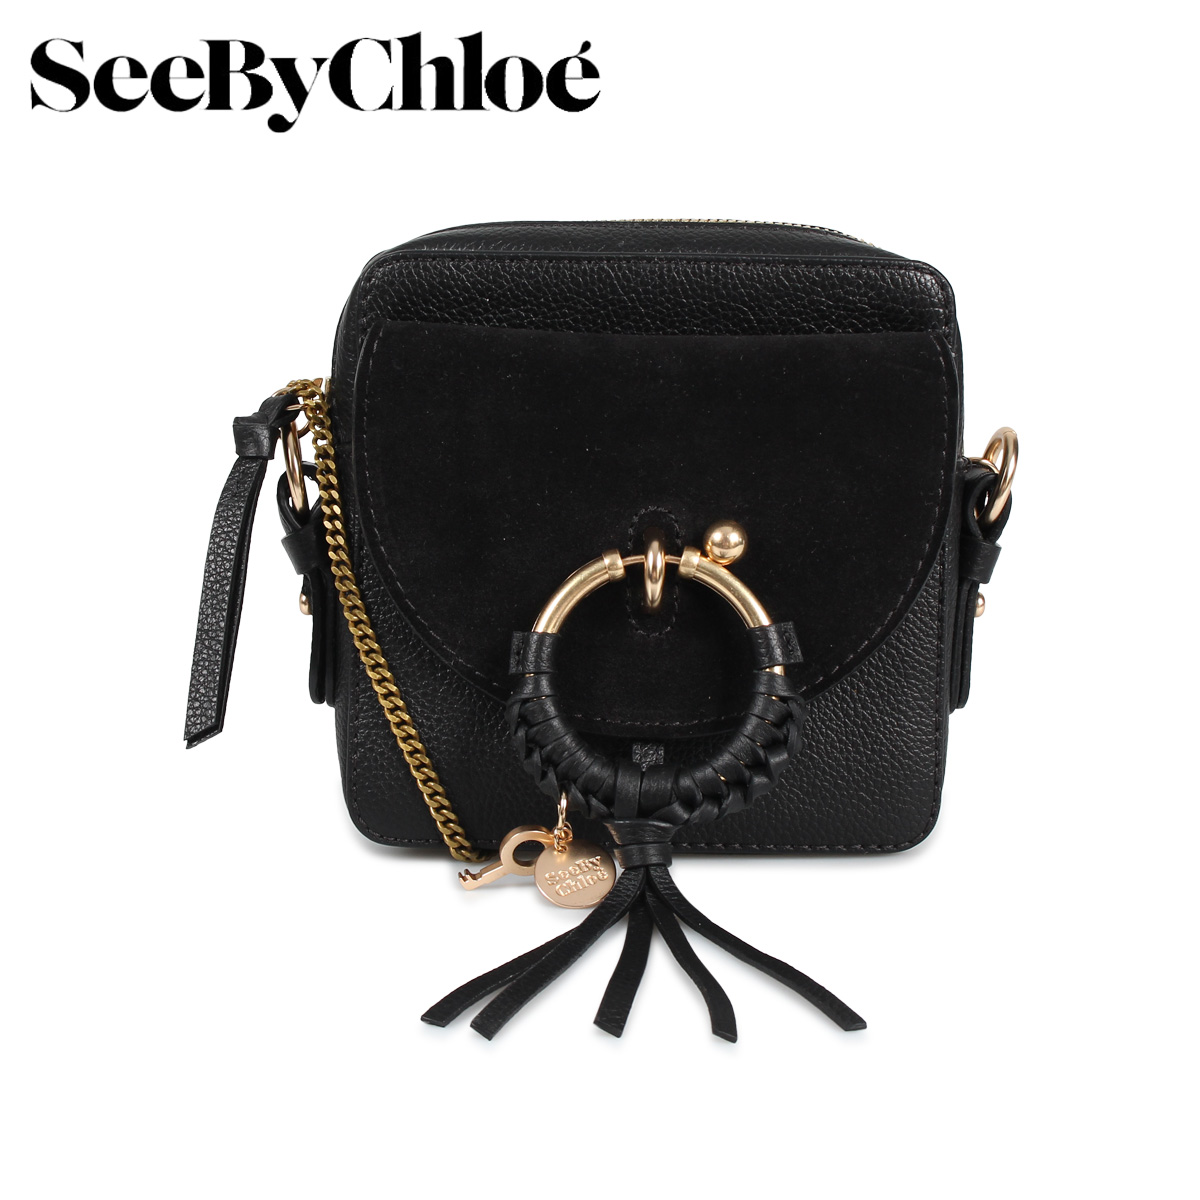 SEE BY CHLOE シーバイクロエ バッグ ショルダーバッグ レディース SHOULDER BAG ブラック 黒 CHS19SS994330